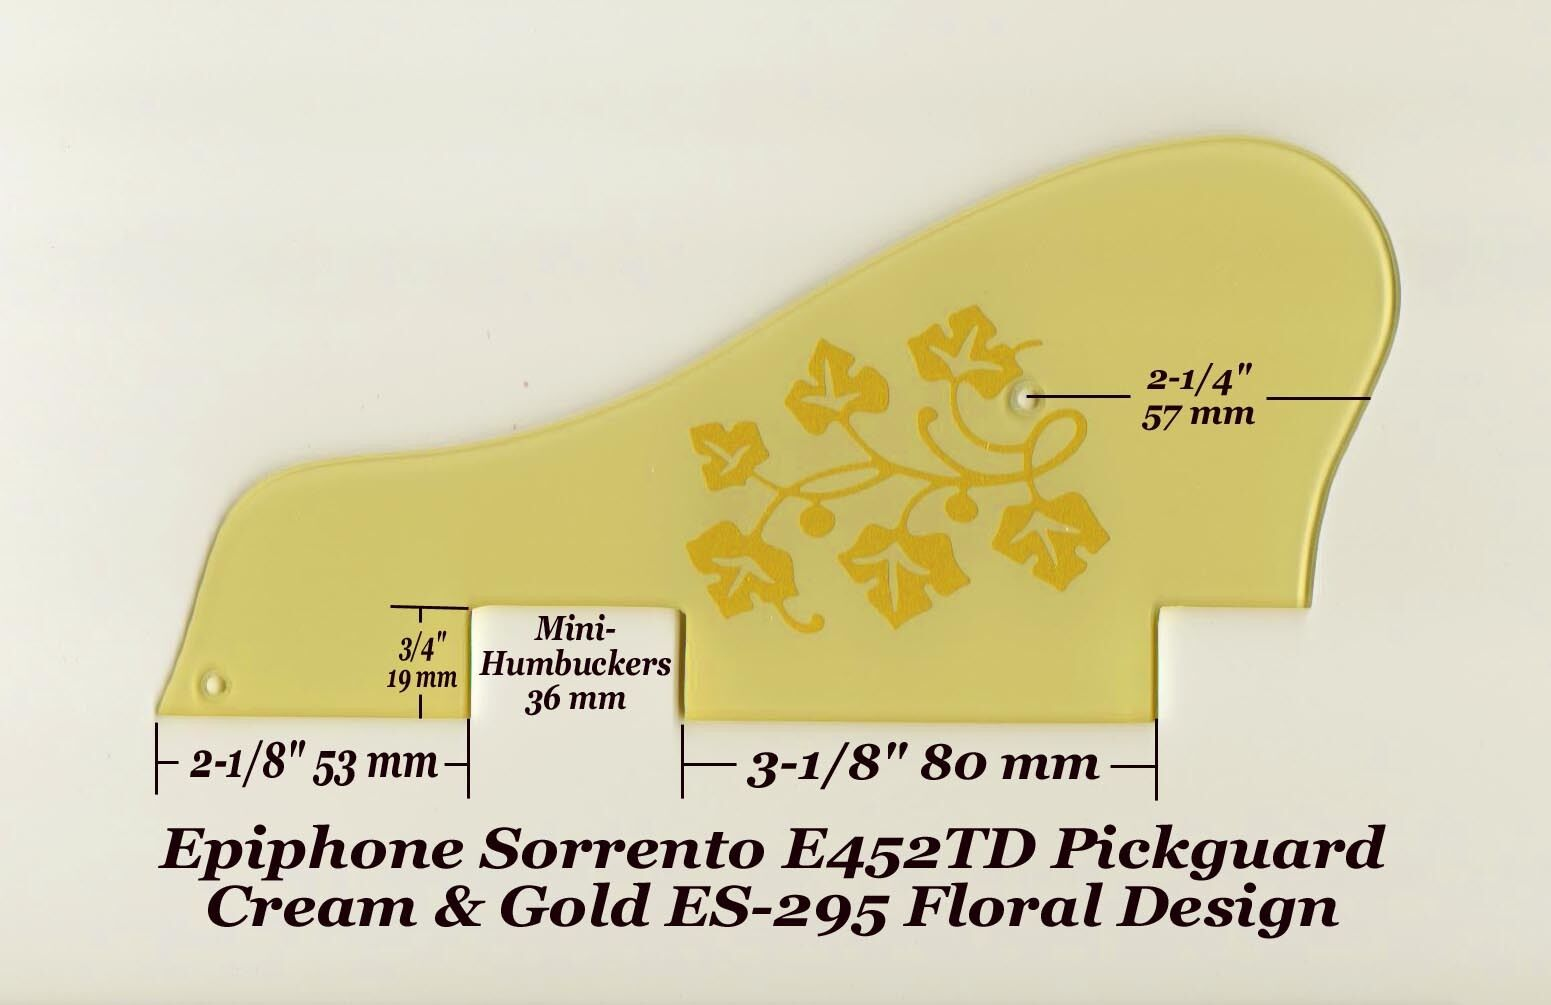 Sorrento E452TD Cream Gold ES-295 Mini-HB Pickguard for Epiphone Guitar Project